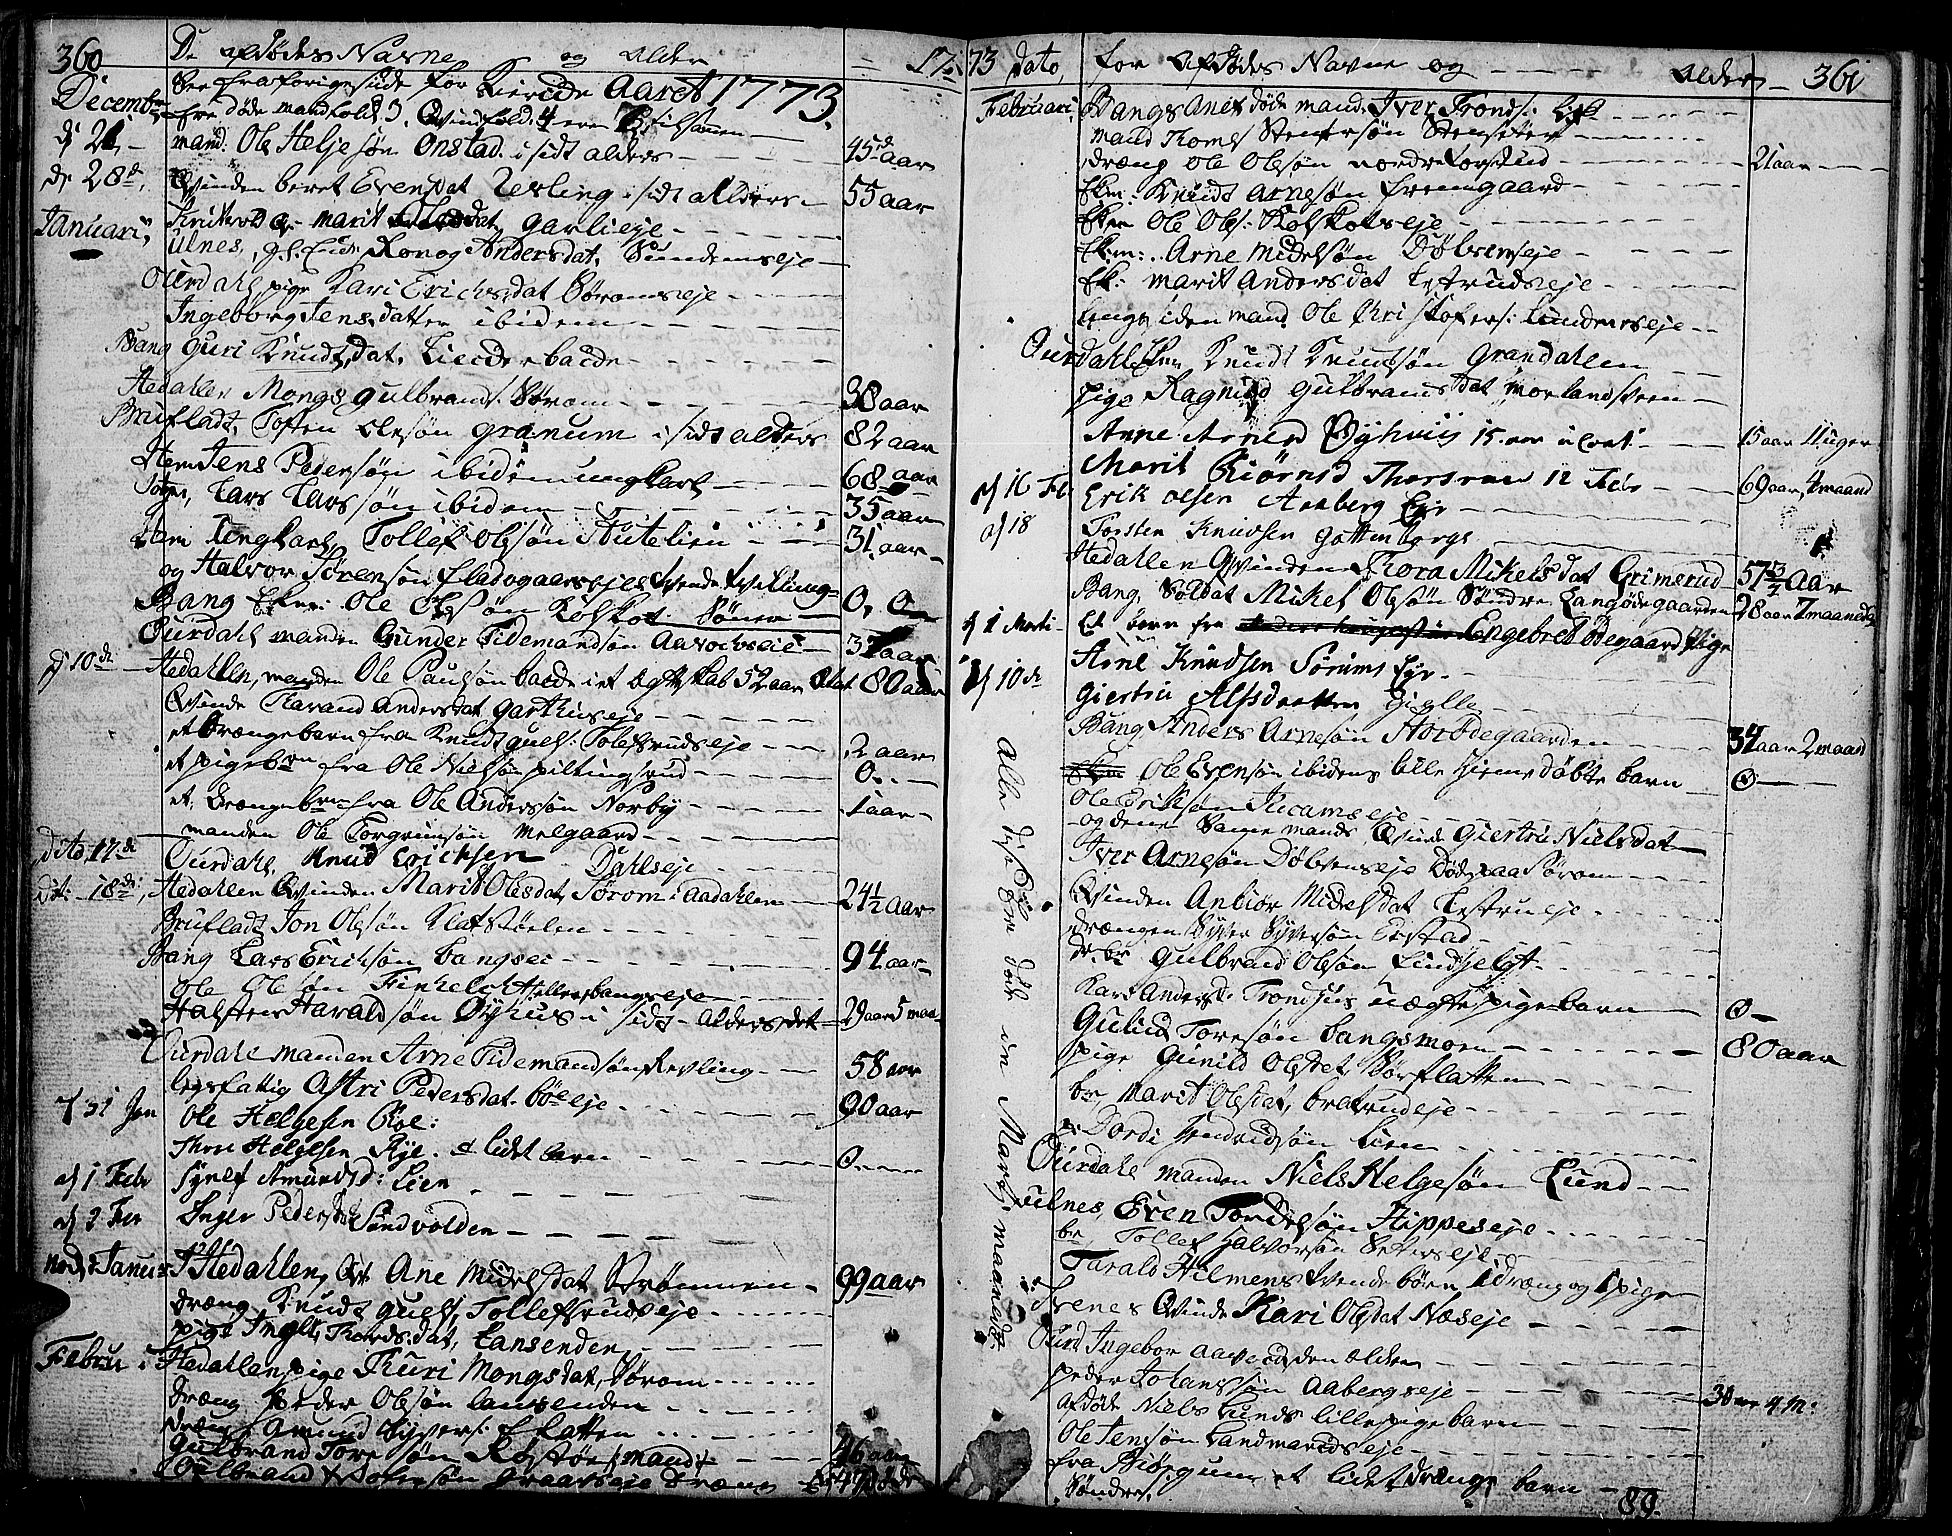 SAH, Aurdal prestekontor, Ministerialbok nr. 5, 1763-1781, s. 360-361